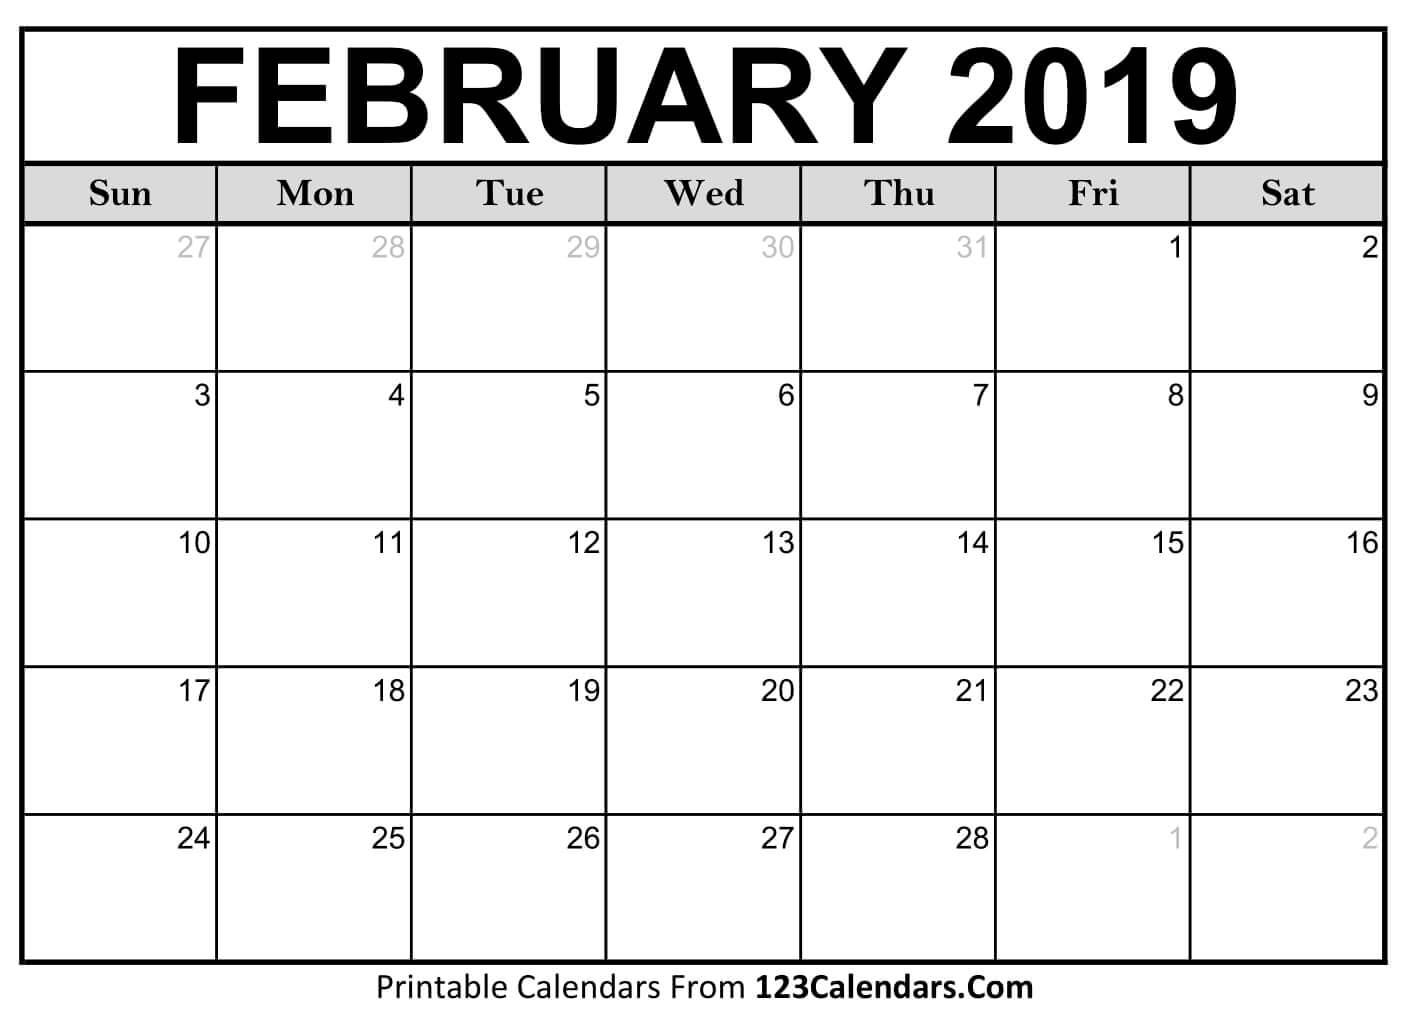 February Calendar 2019 Template